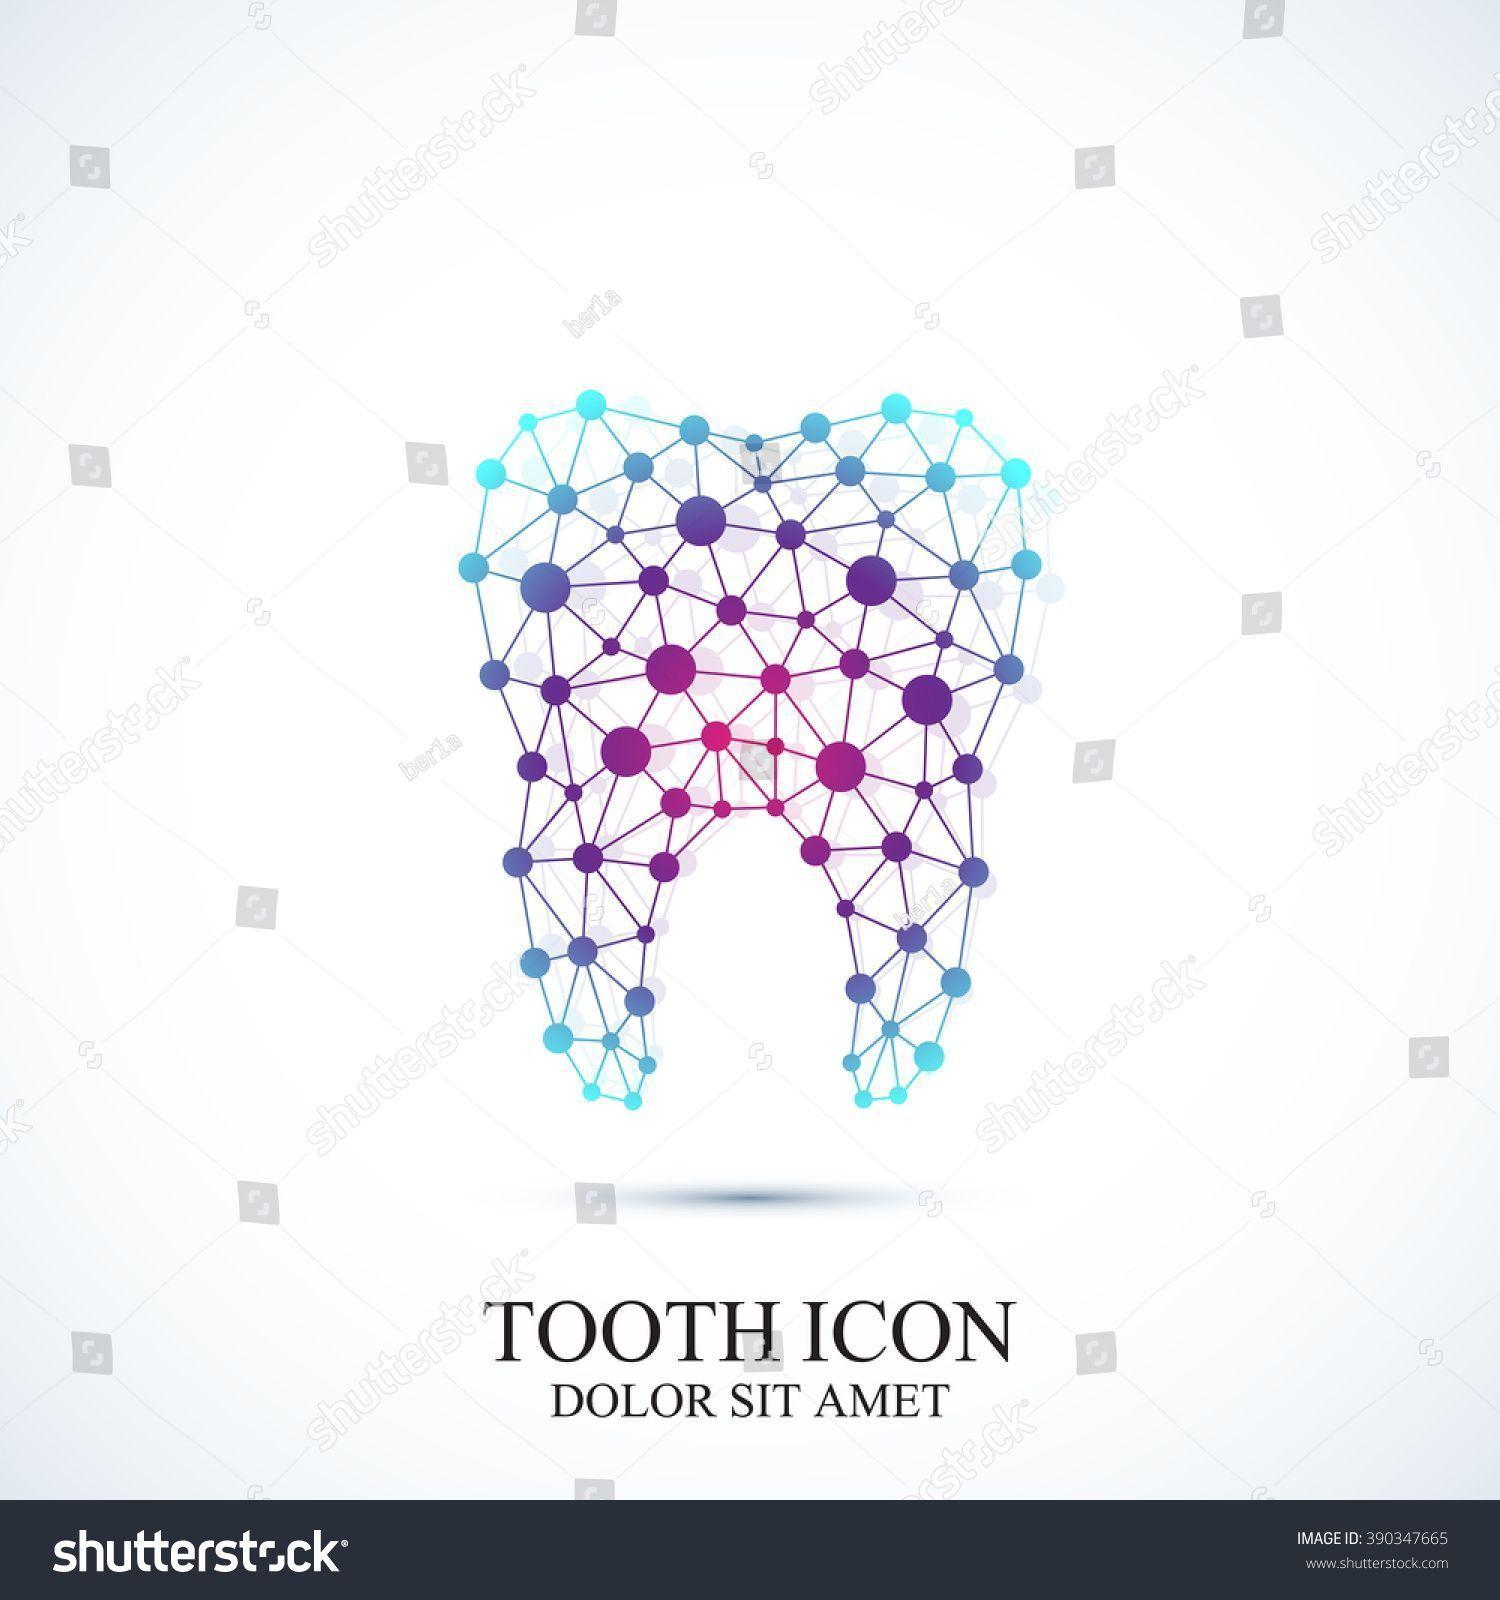 Utopian Dental Implants Cost United States